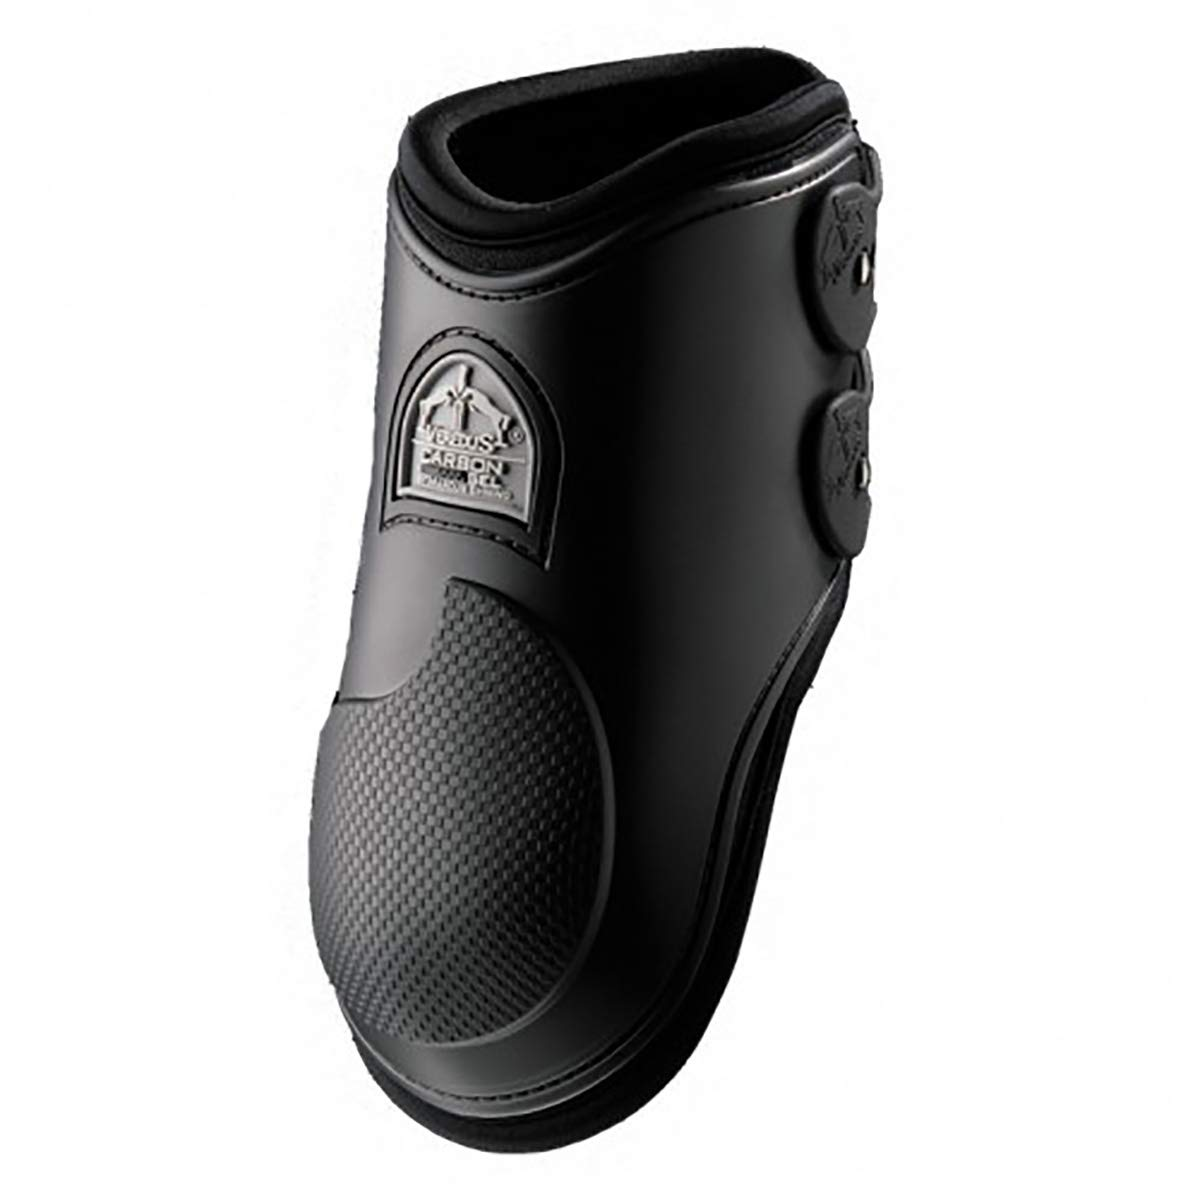 Veredus - Fetlock Carbon Gel Vento Rear - Horse Boots - Made in Italy - Black